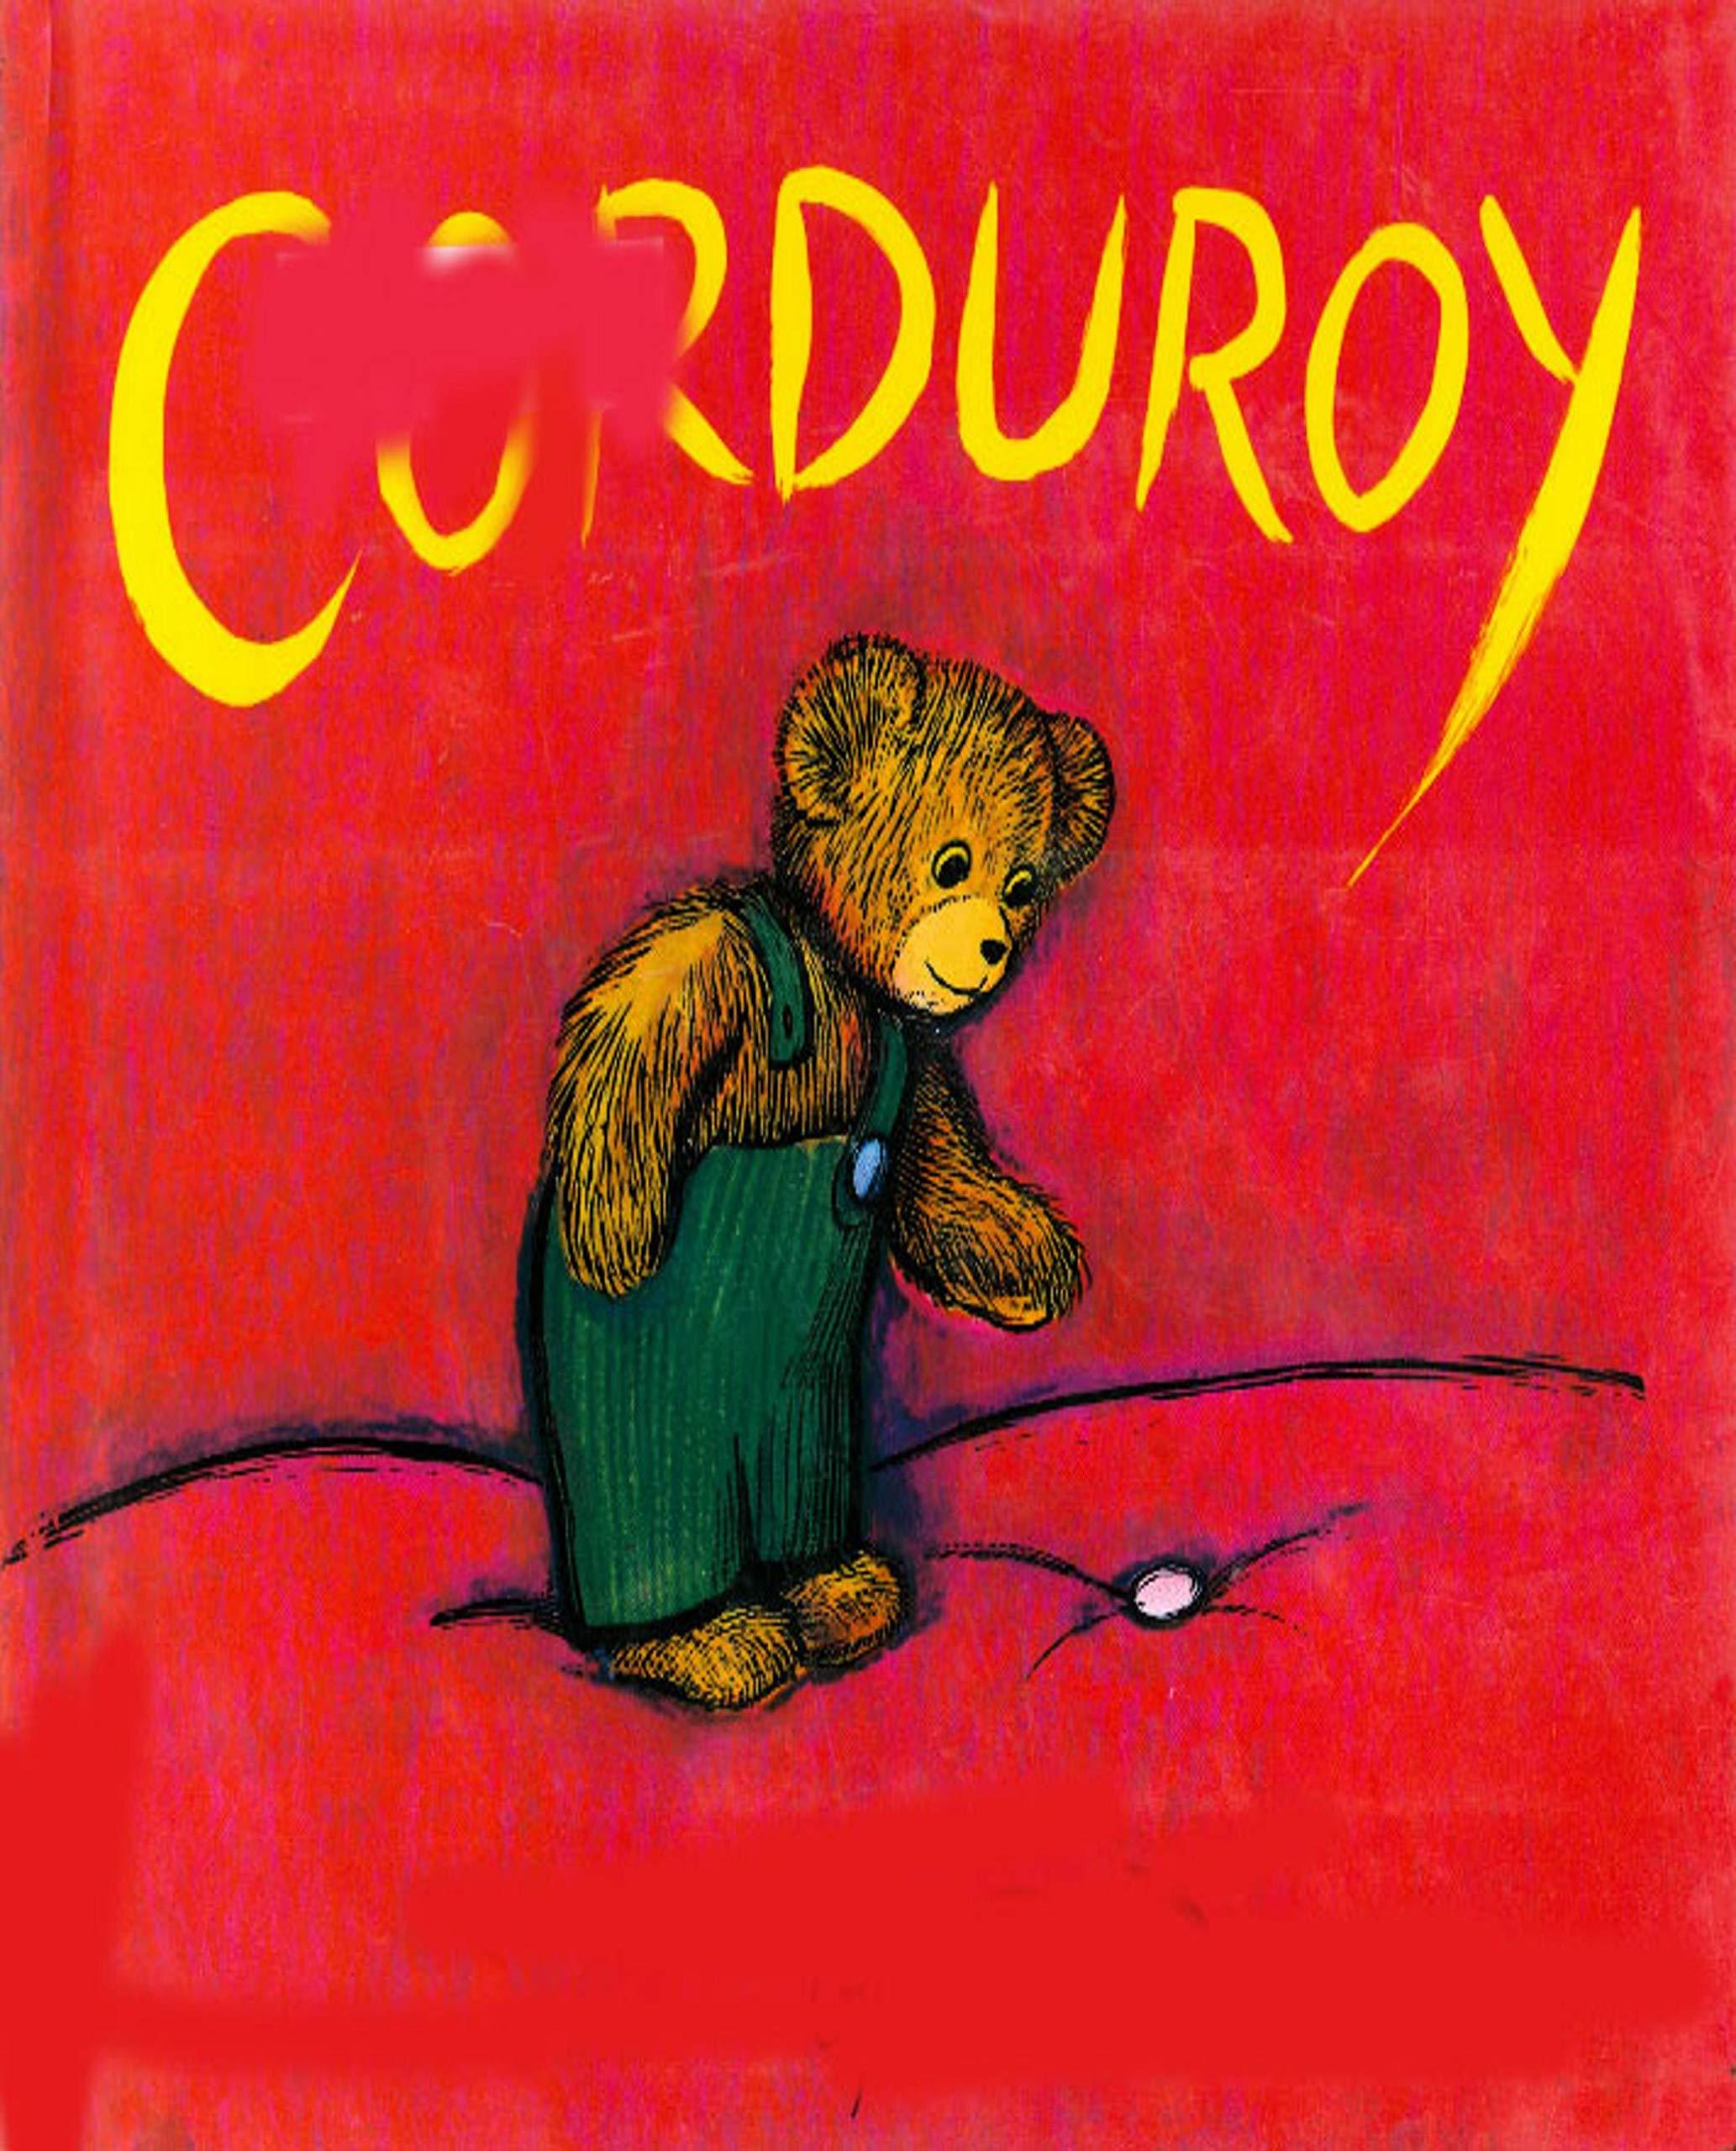 Corduroy - Don Freeman (1968) (Joobles-Reading: Picture books for children's Enlightenment